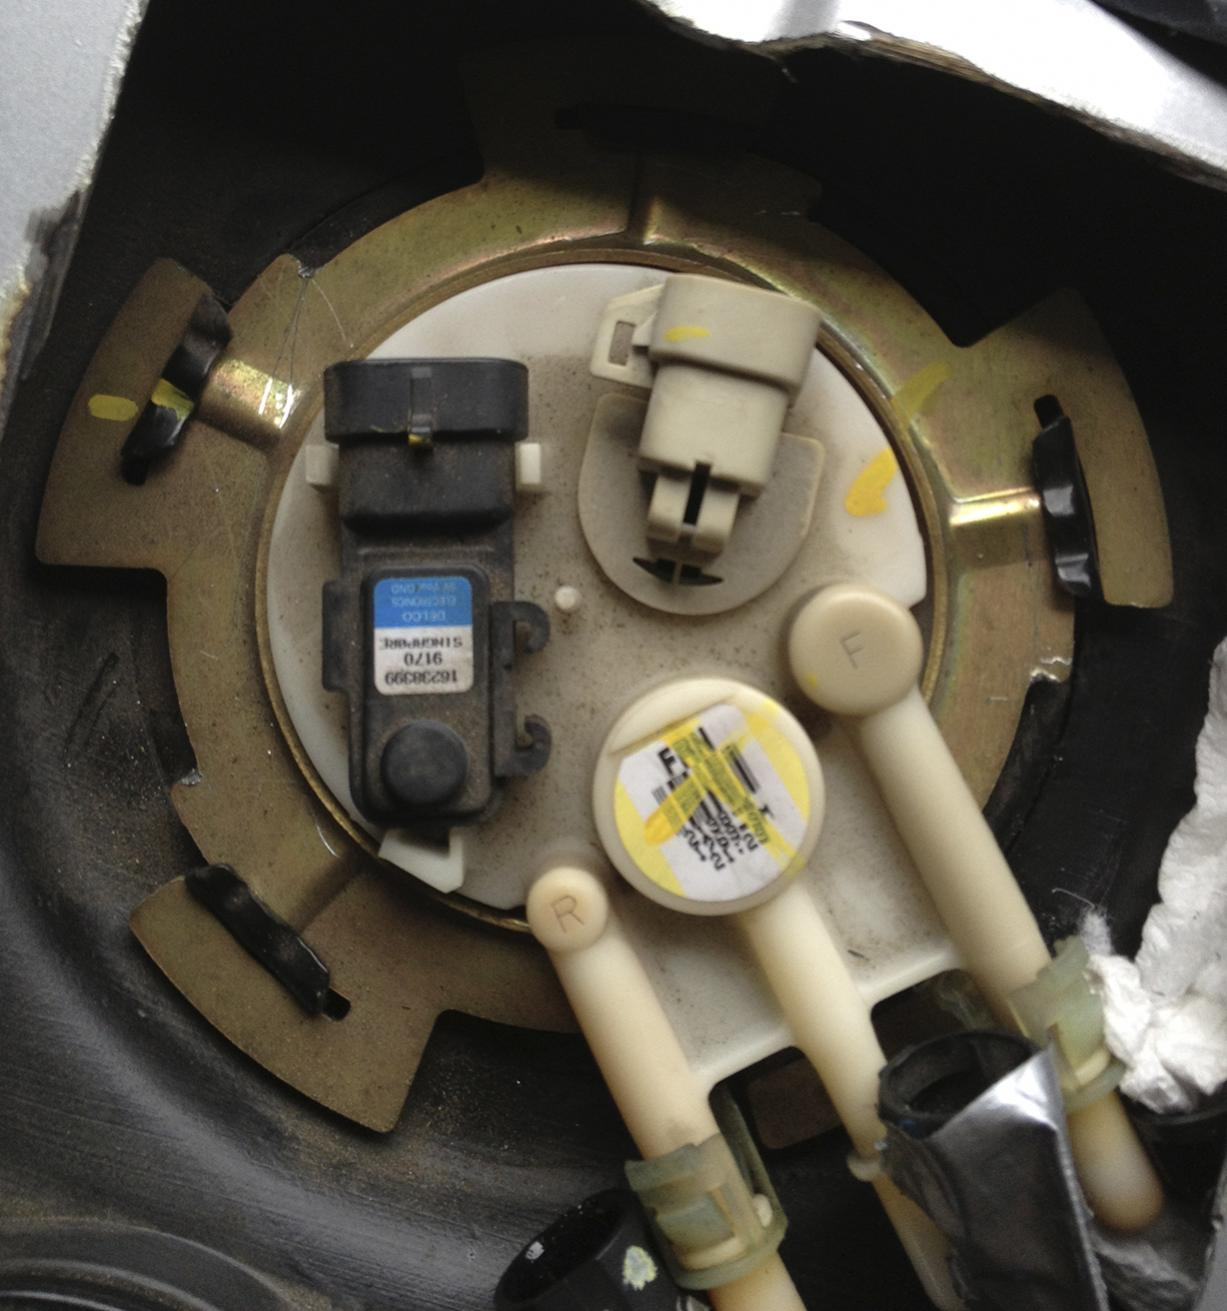 images?q=tbn:ANd9GcQh_l3eQ5xwiPy07kGEXjmjgmBKBRB7H2mRxCGhv1tFWg5c_mWT 2003 Chevy Silverado 2500hd Fuel Pump Wiring Diagram